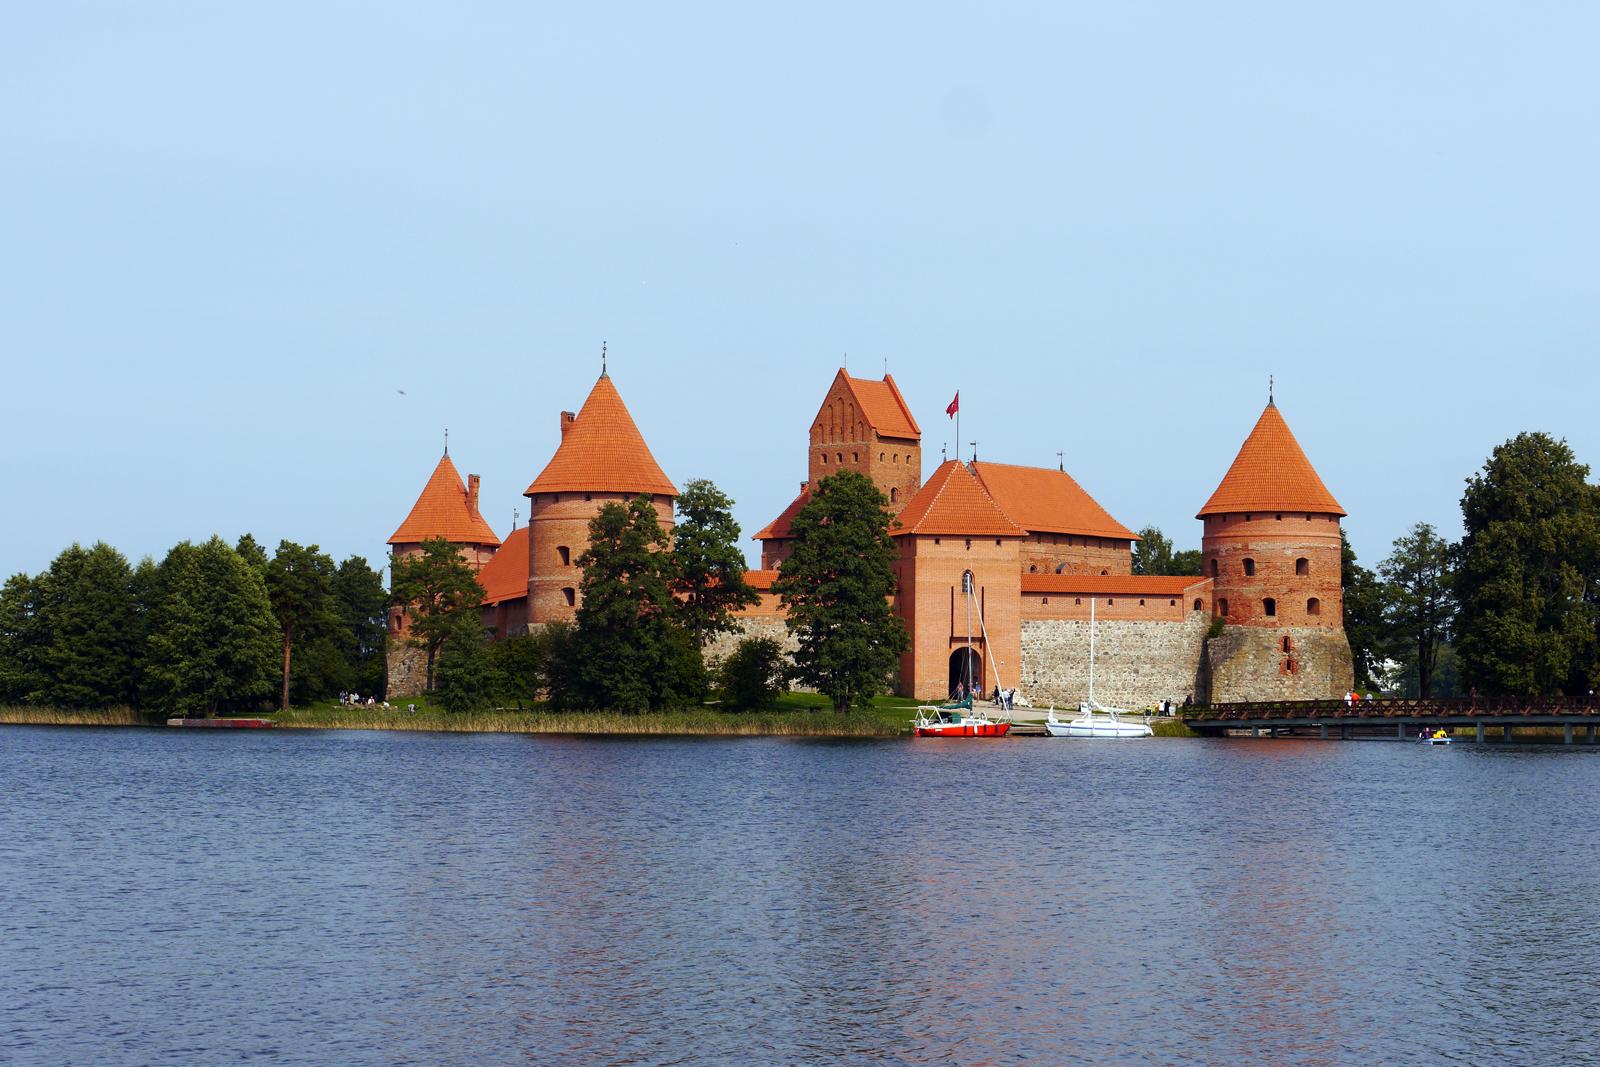 Trakai Wasserschloss in Litauen